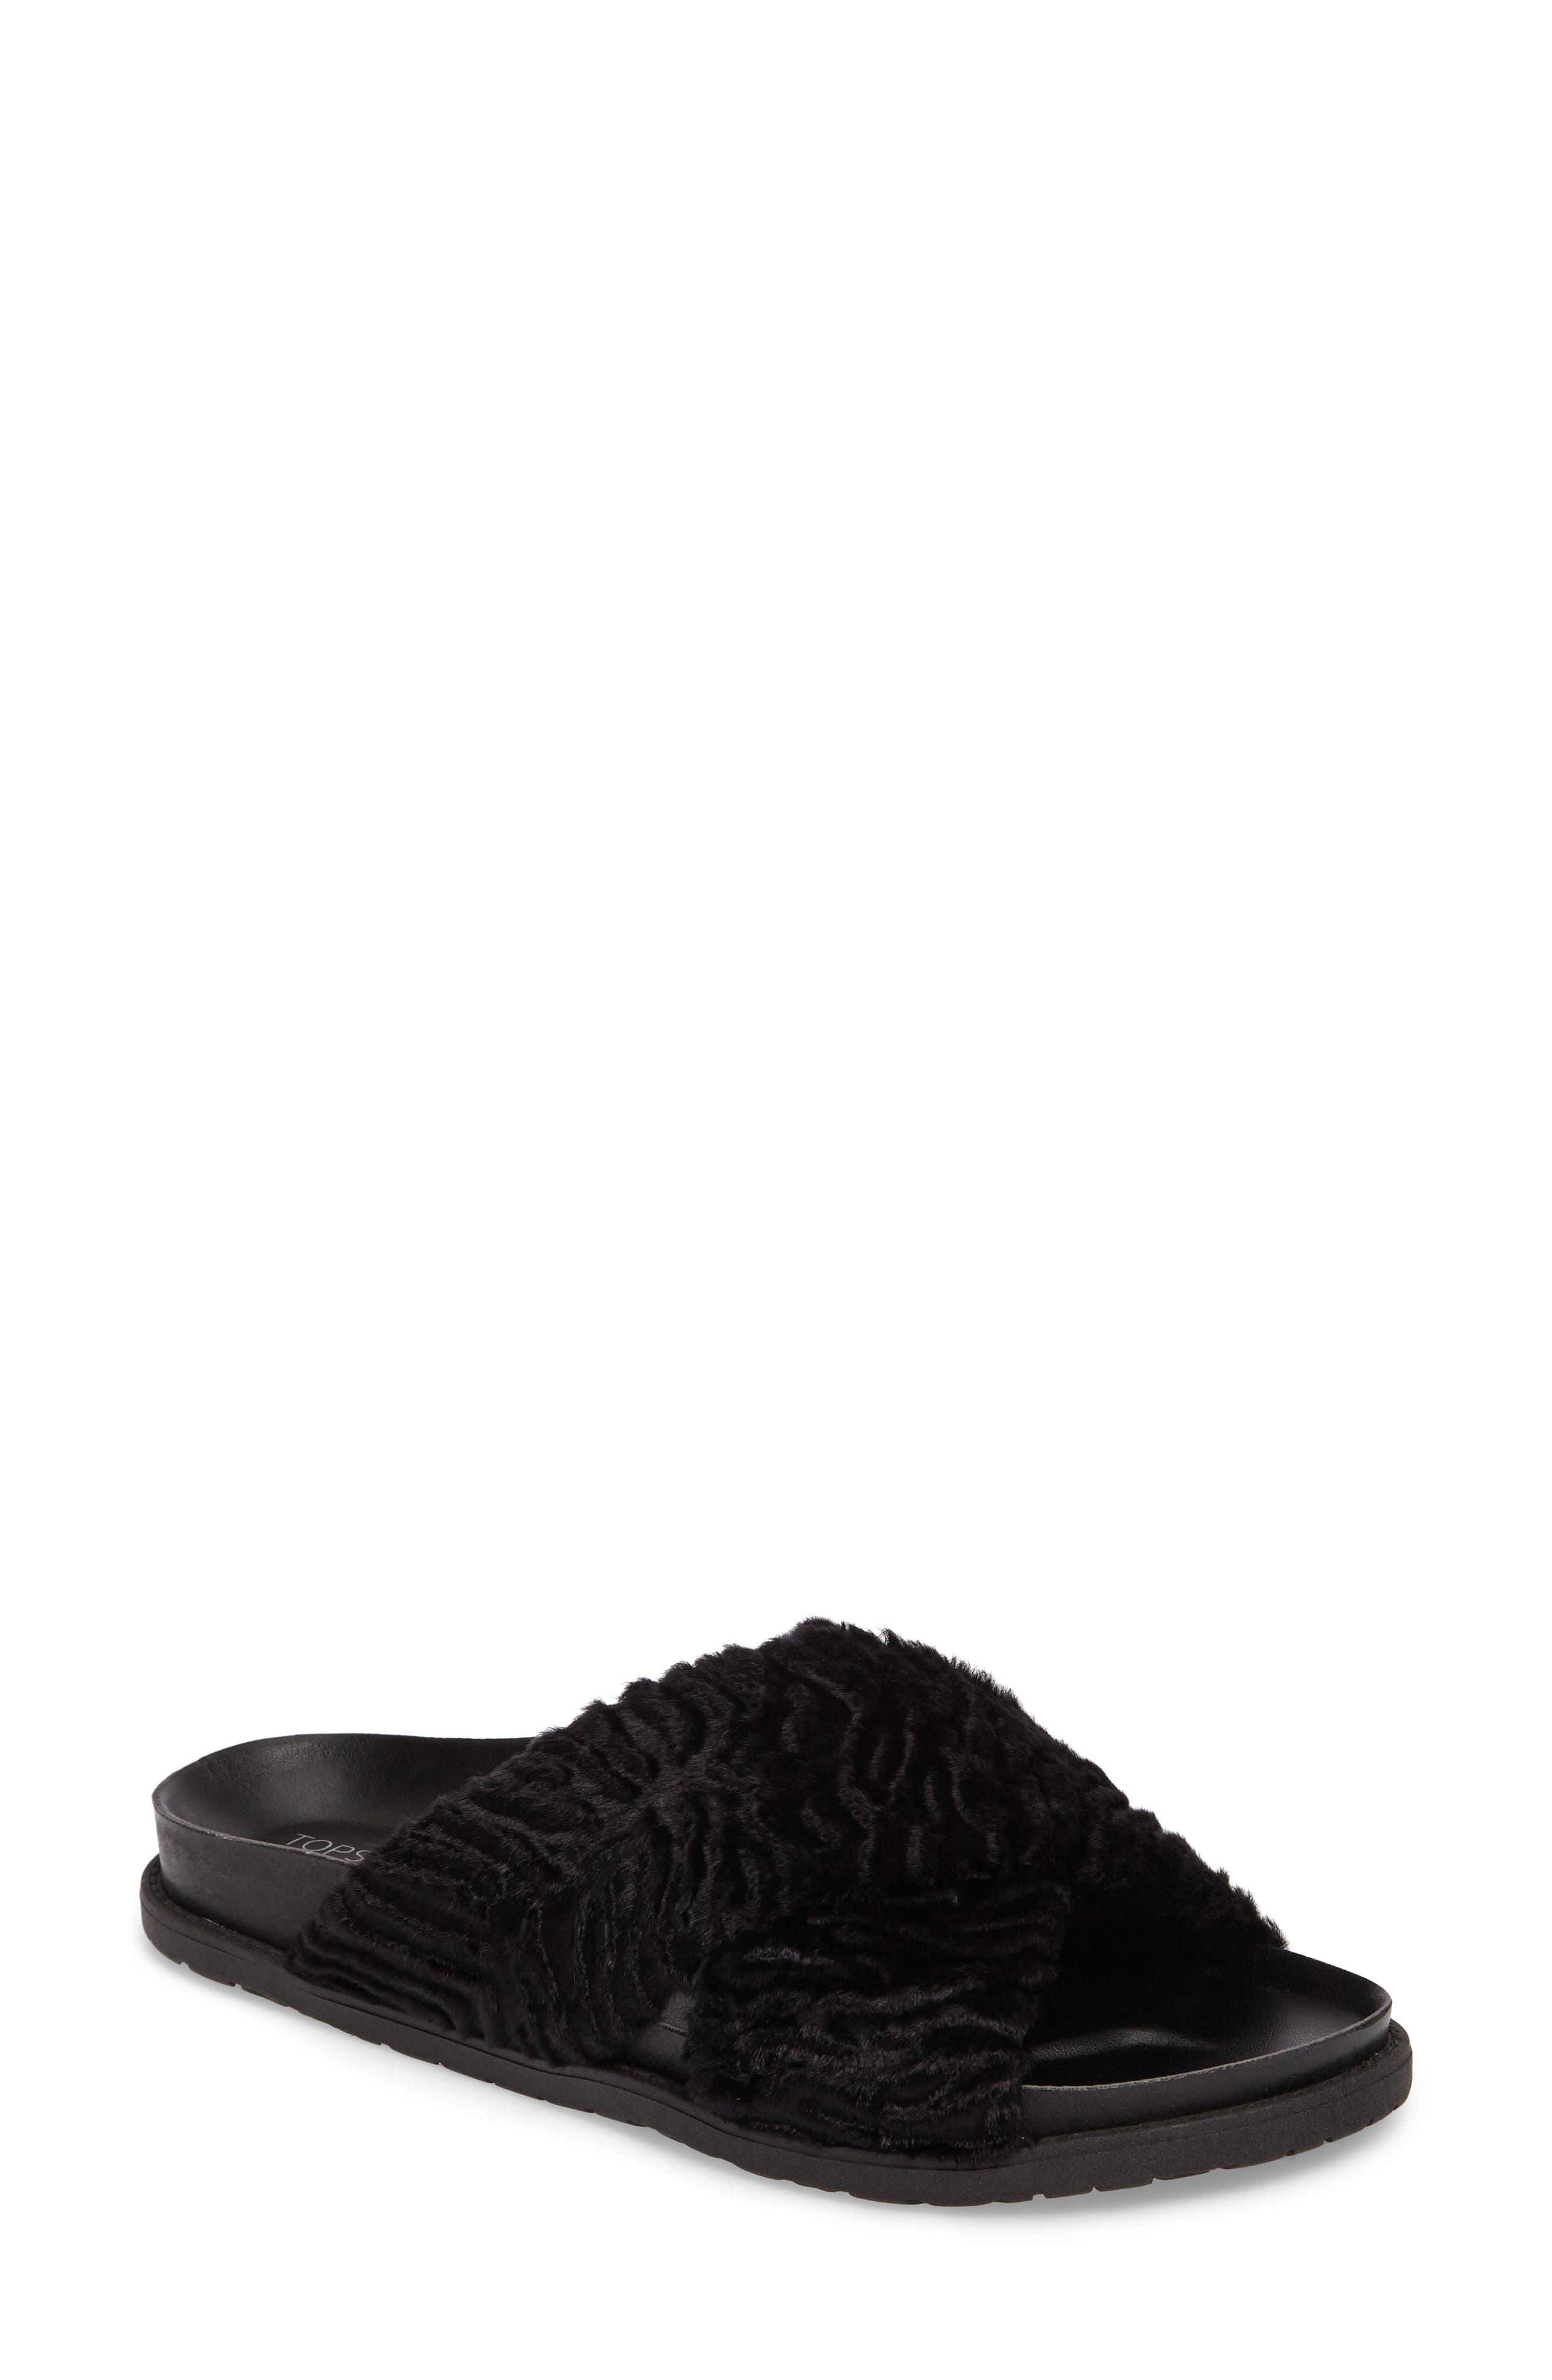 Topshop Harissa Textured Faux Fur Slide Sandal (Women)